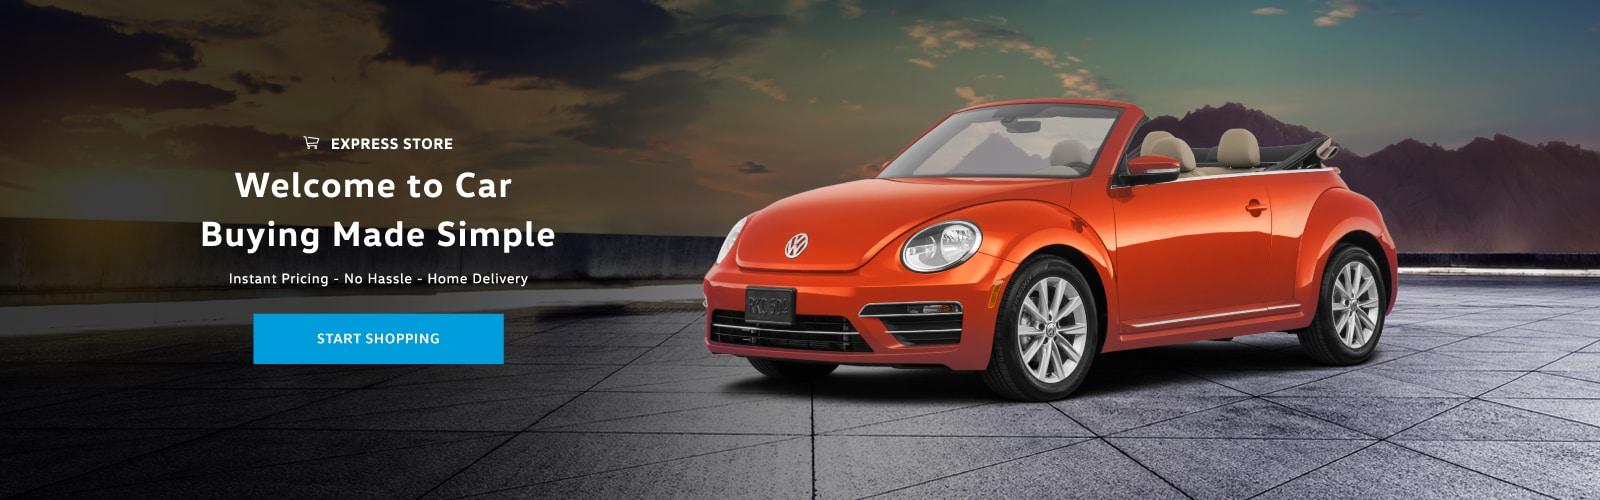 Larry Miller Vw >> Larry H Miller Volkswagen Avondale Volkswagen Dealership In